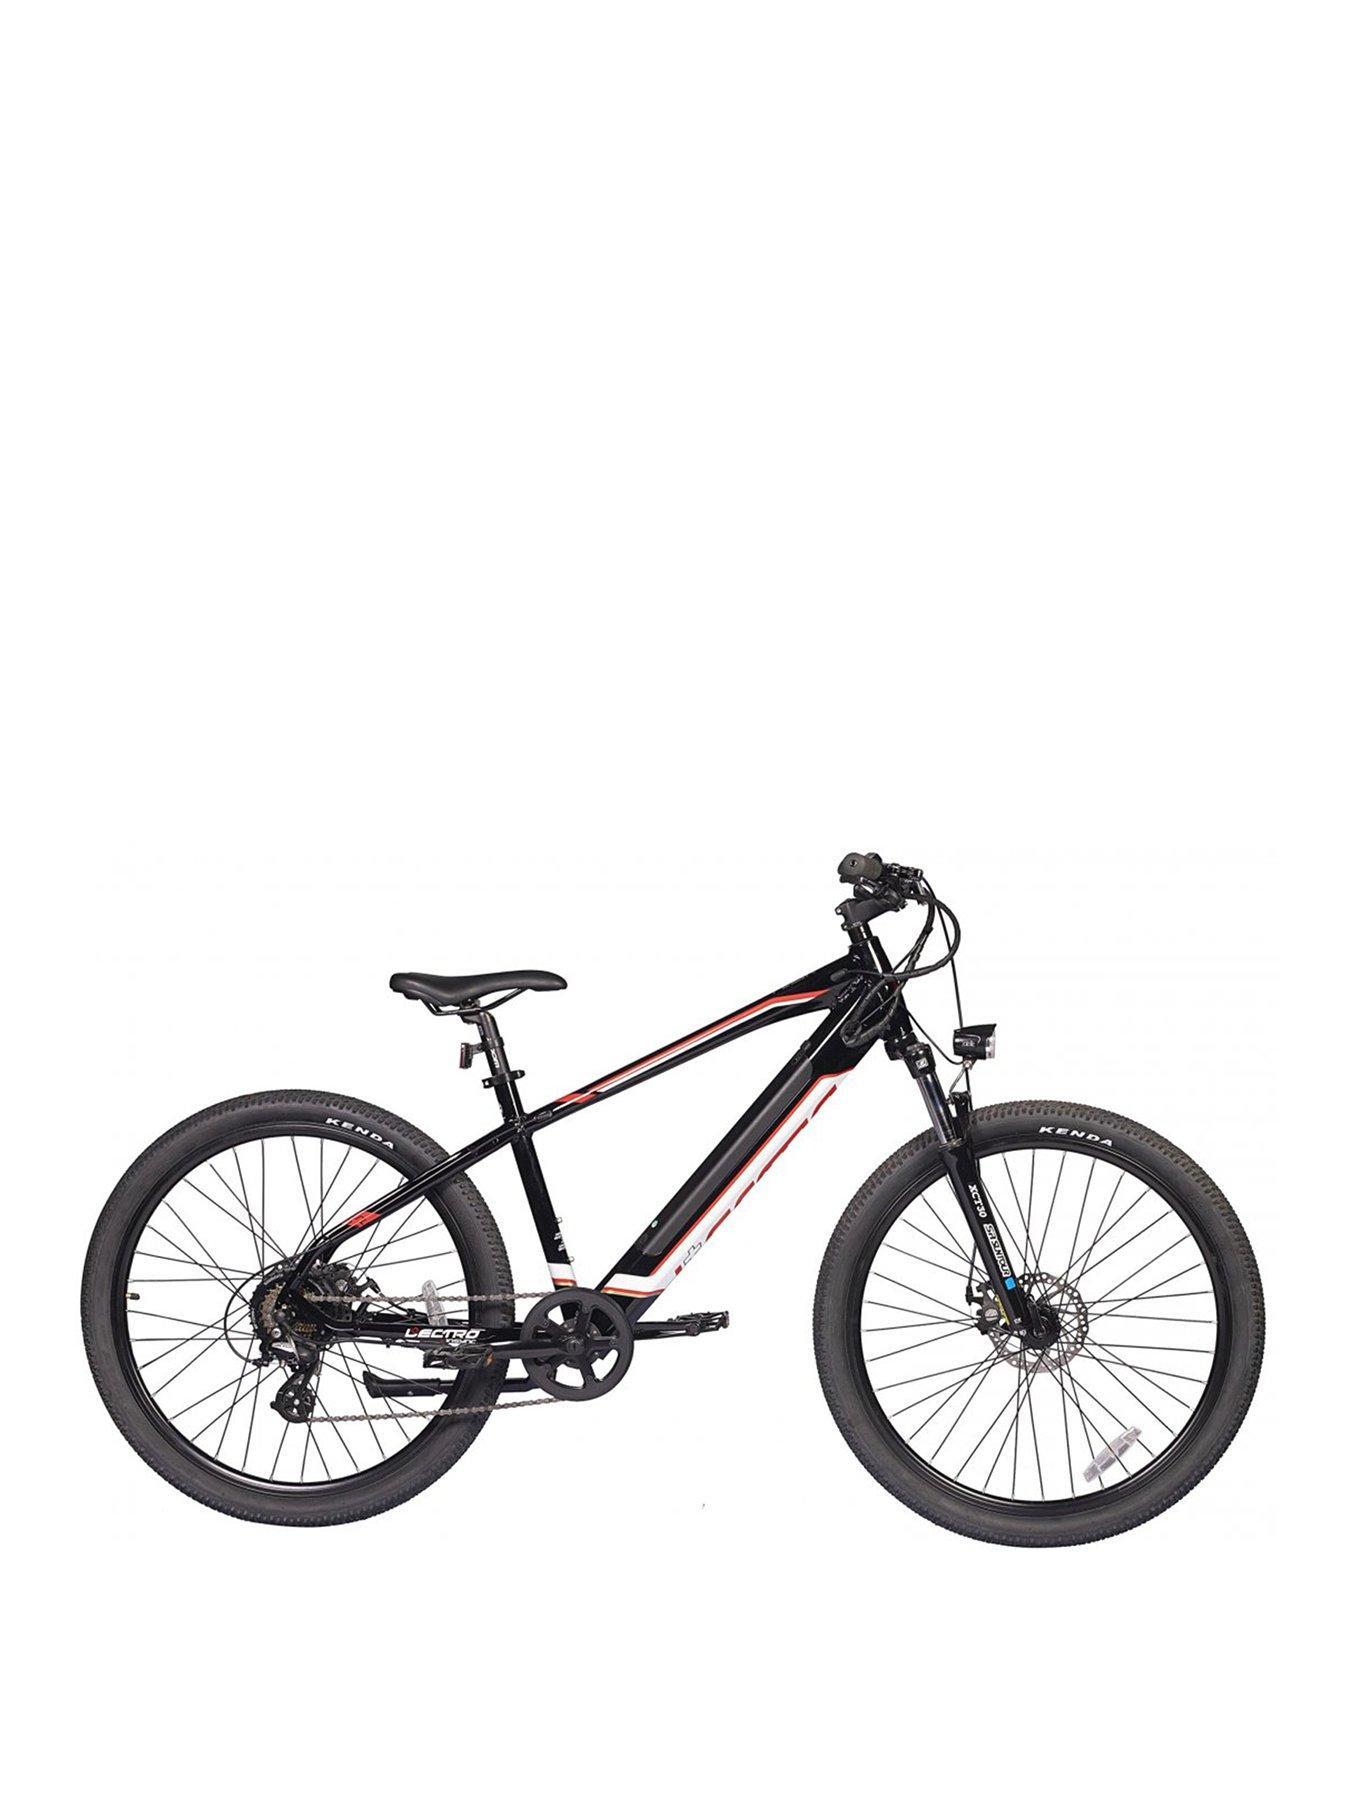 JIMITO Portable Bicycle Handlebar Kettle Bag for Mountain Bike Motorcycles